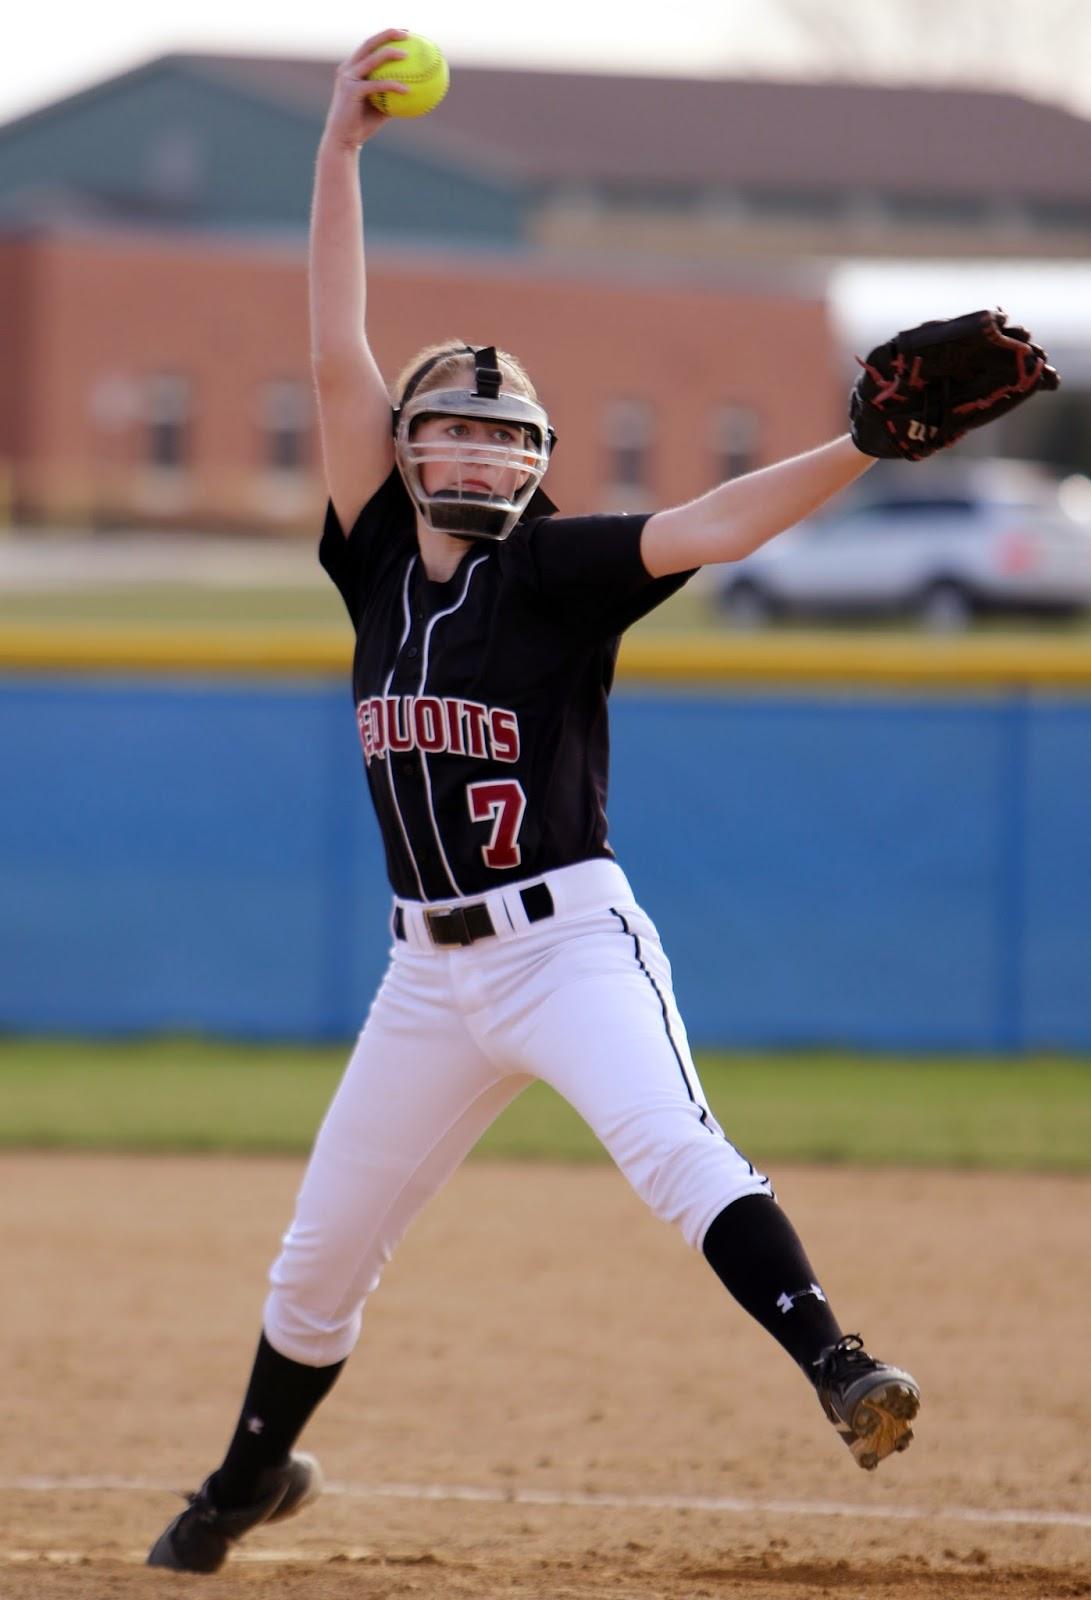 Why Hitting A Softball Is Harder Than Hitting A Baseball